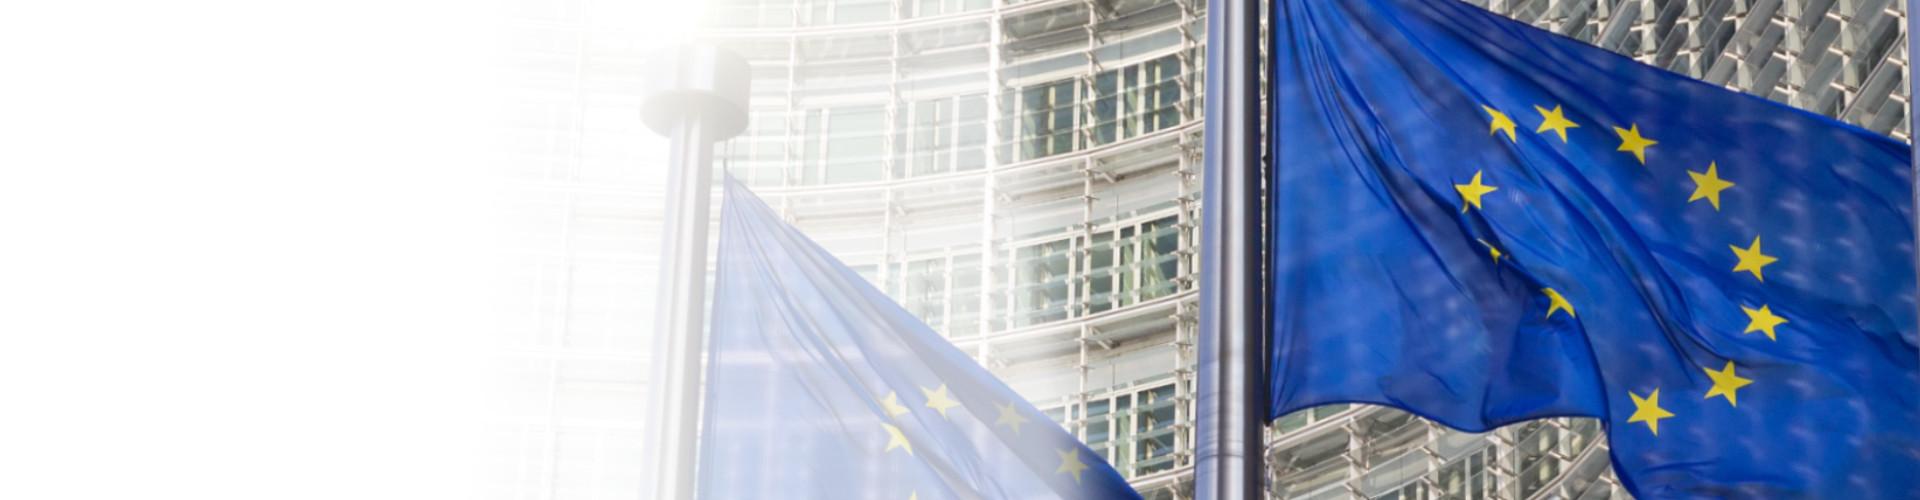 EU Flagge vor dem Kommissionsgebäude © VanderWolf Images, stock.adobe.com